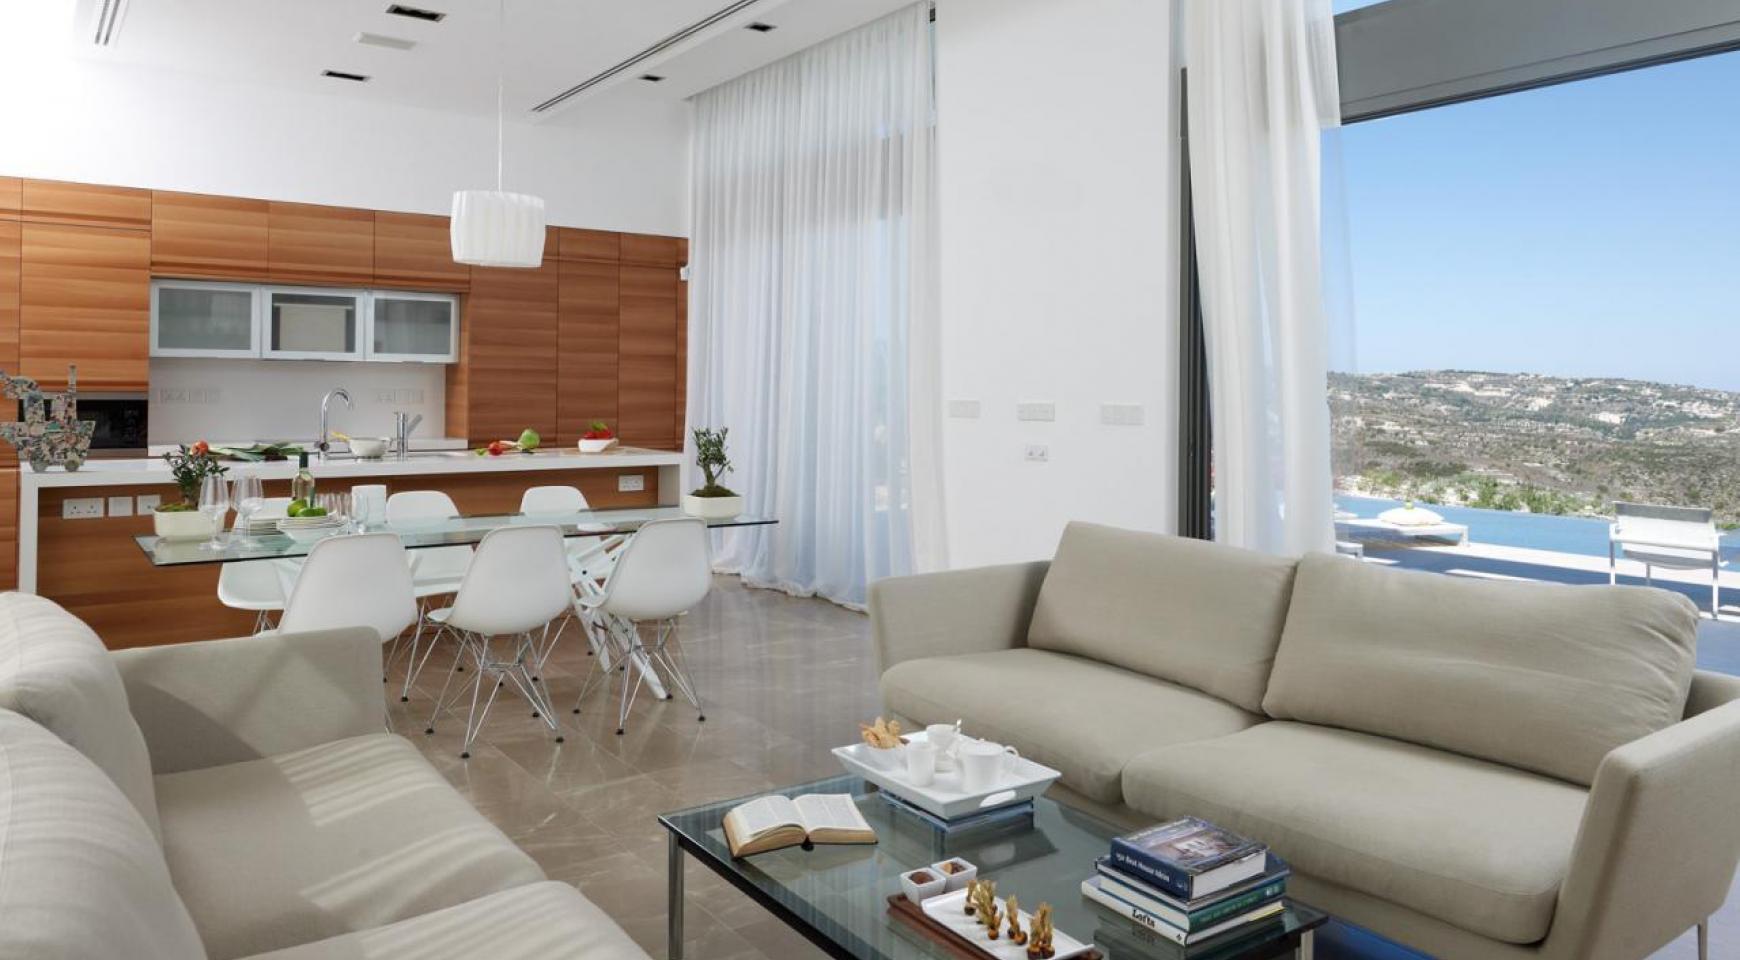 Golf Property - Exclusive 4 Bedroom Villa  - 12